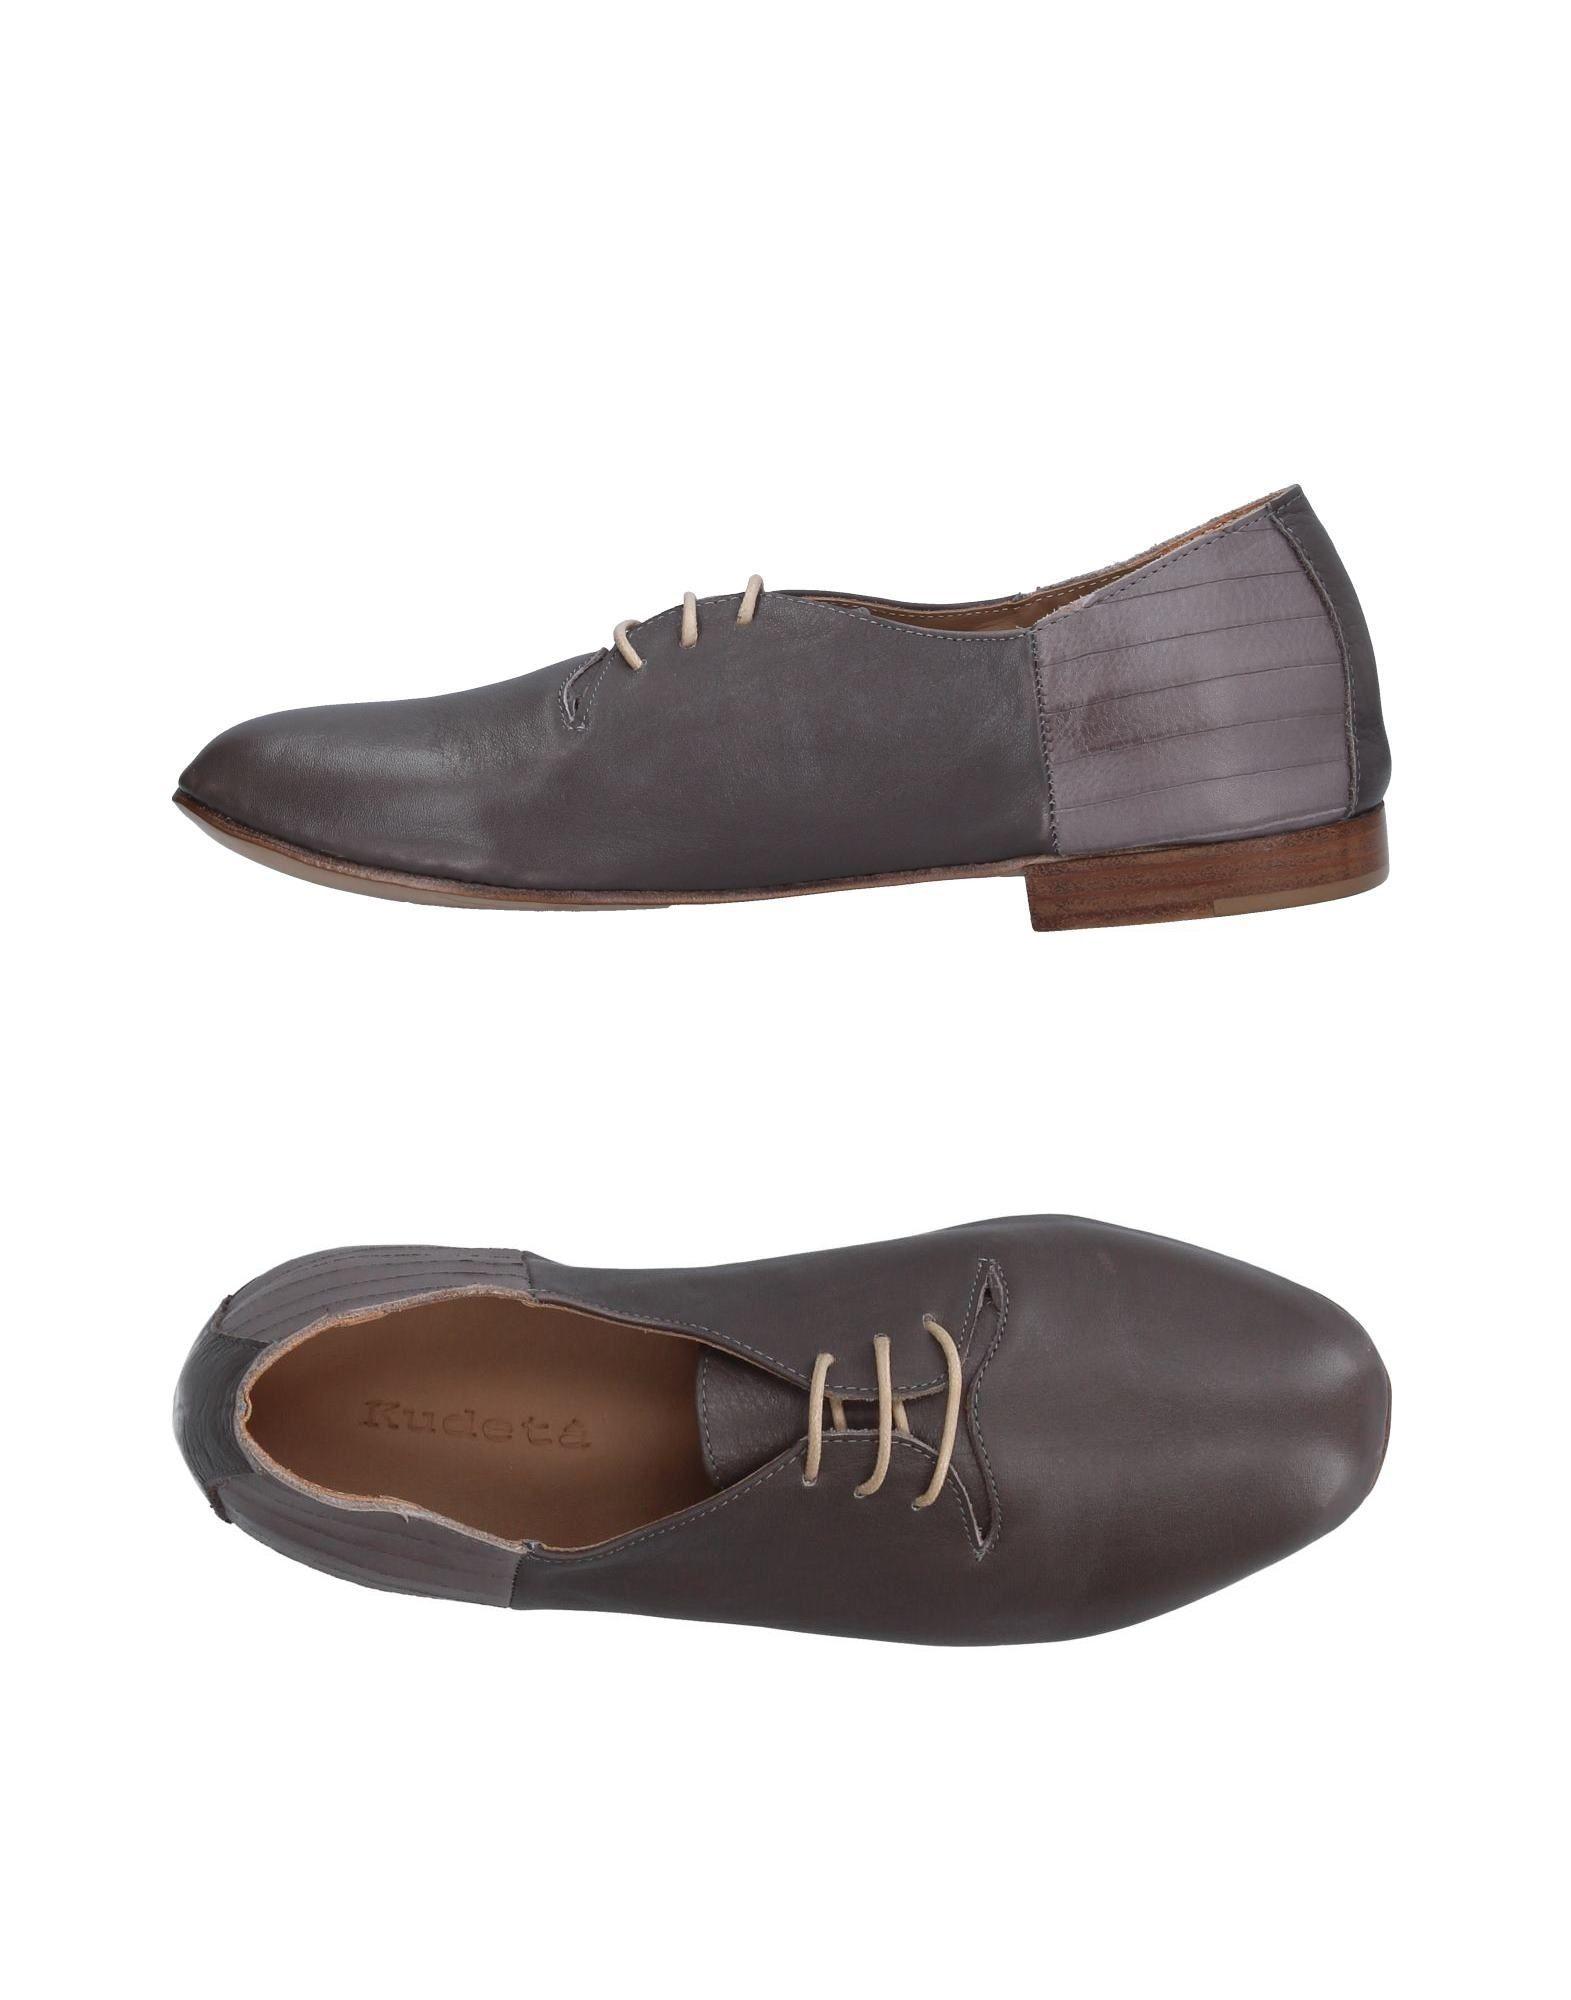 KUDETÀ Обувь на шнурках сандалии ия 2017 круглый нос летняя обувь кожаная обувь обувь с пряжечной кожаная обувь